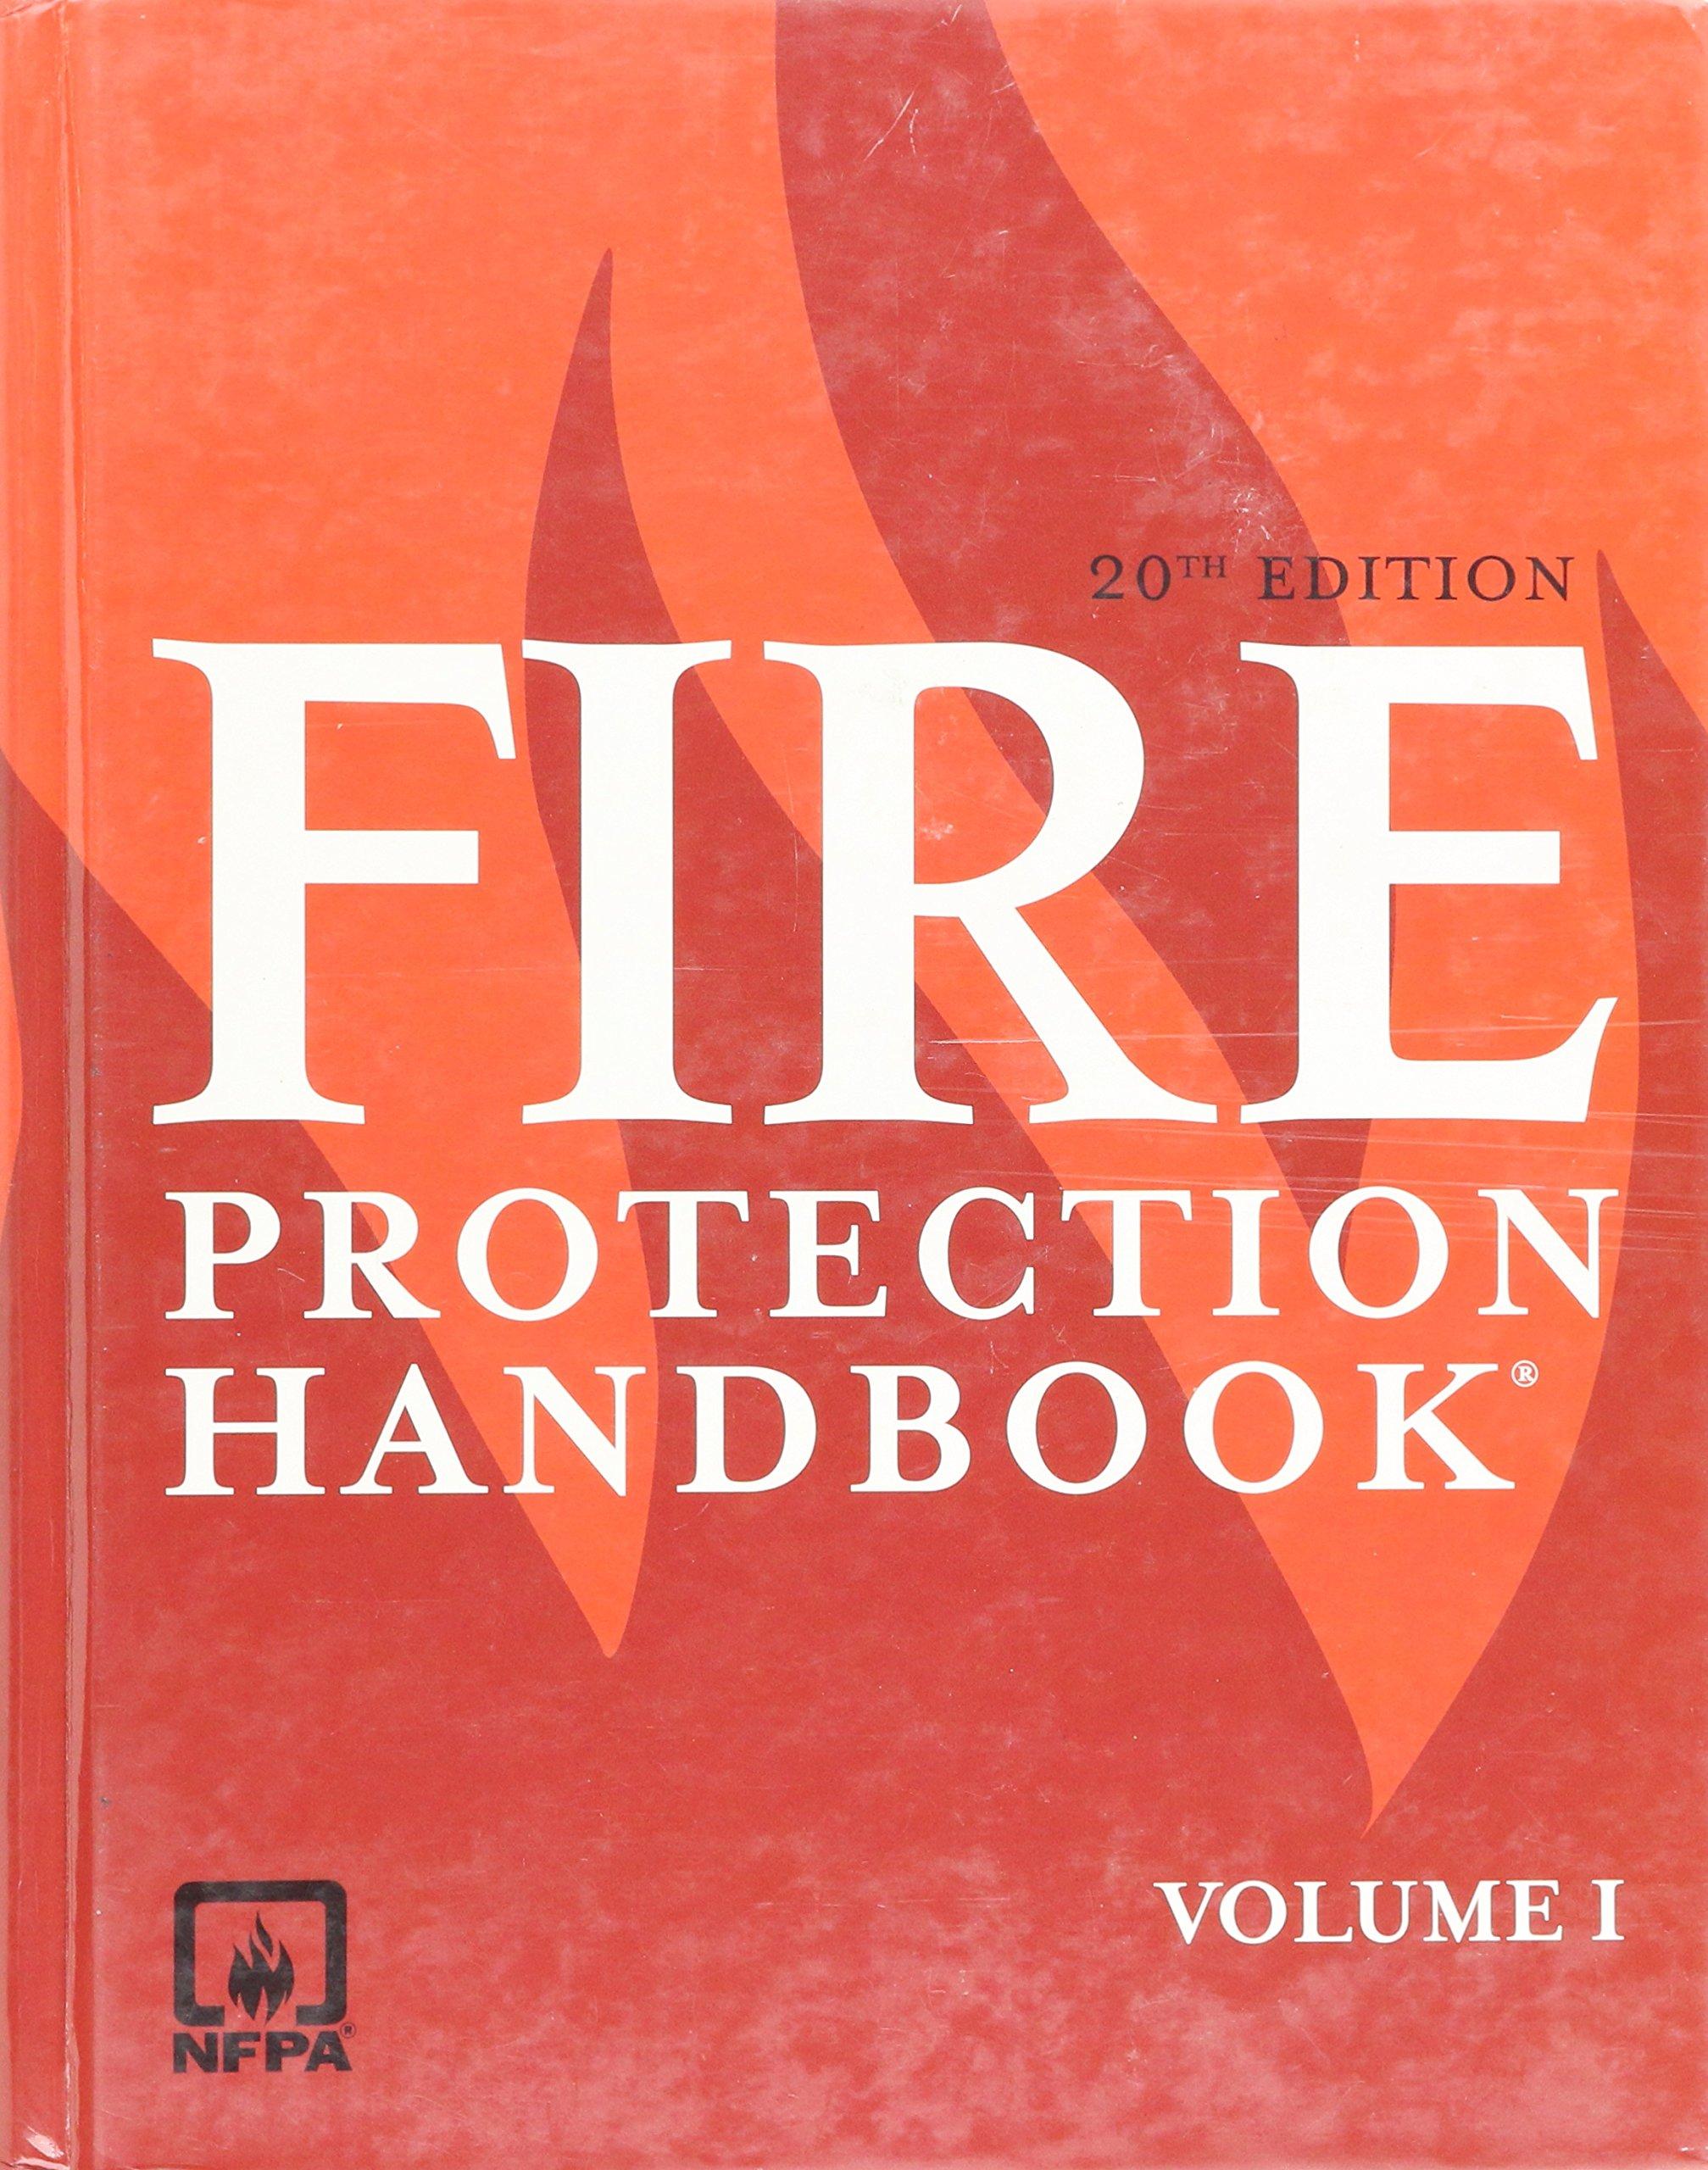 Nfpa Fire Protection Handbook Pdf